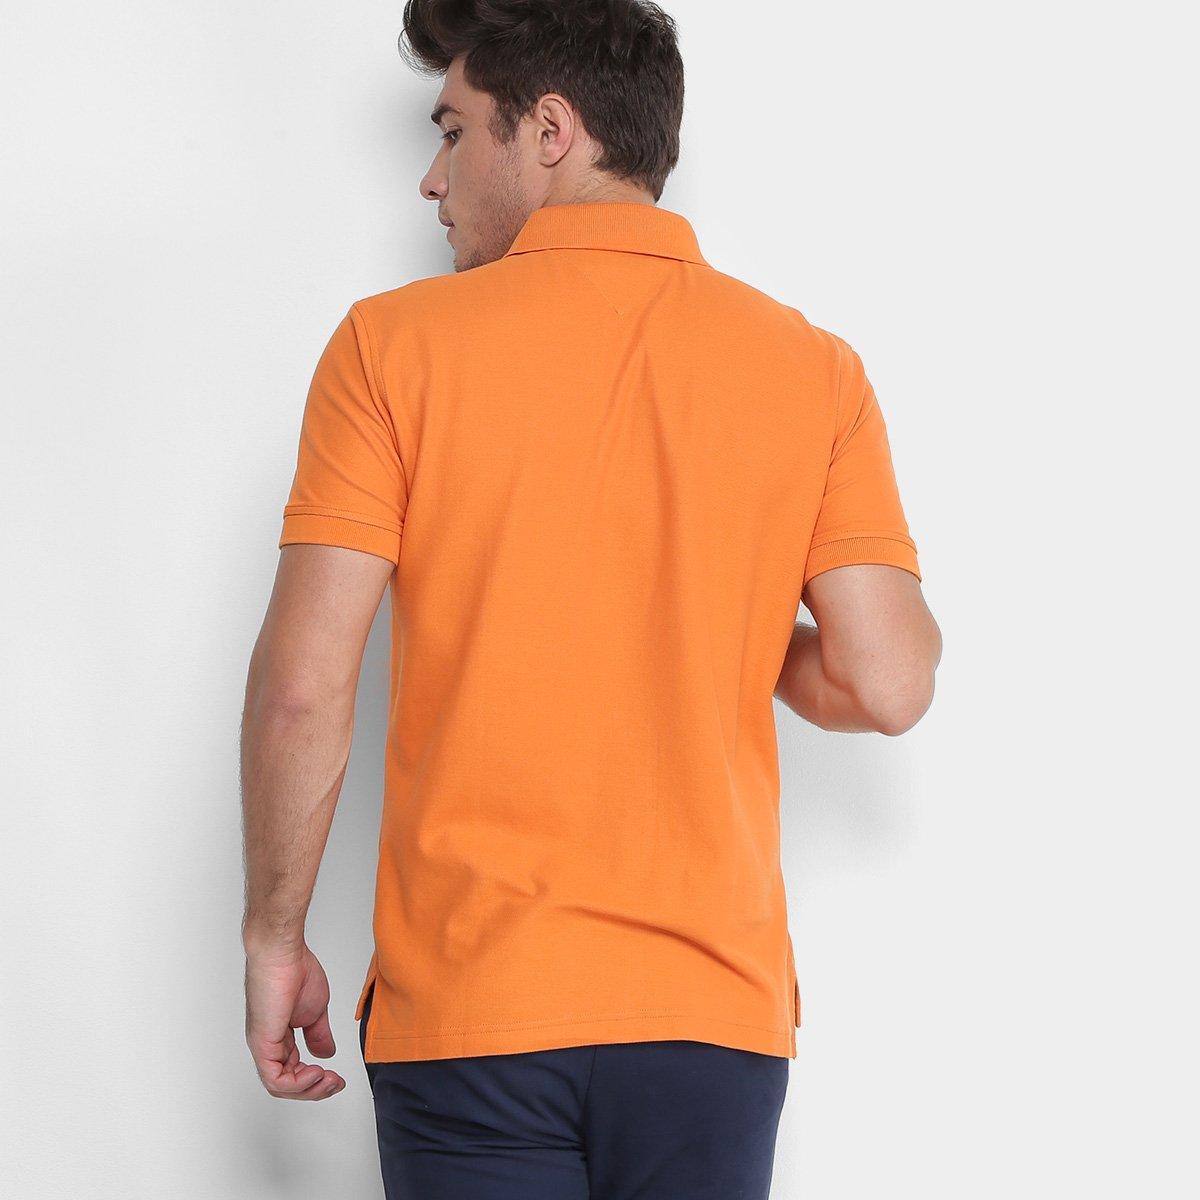 9b0b490f19 ... Camisa Polo Tommy Hilfiger Performance Regular Elastano Masculina ...